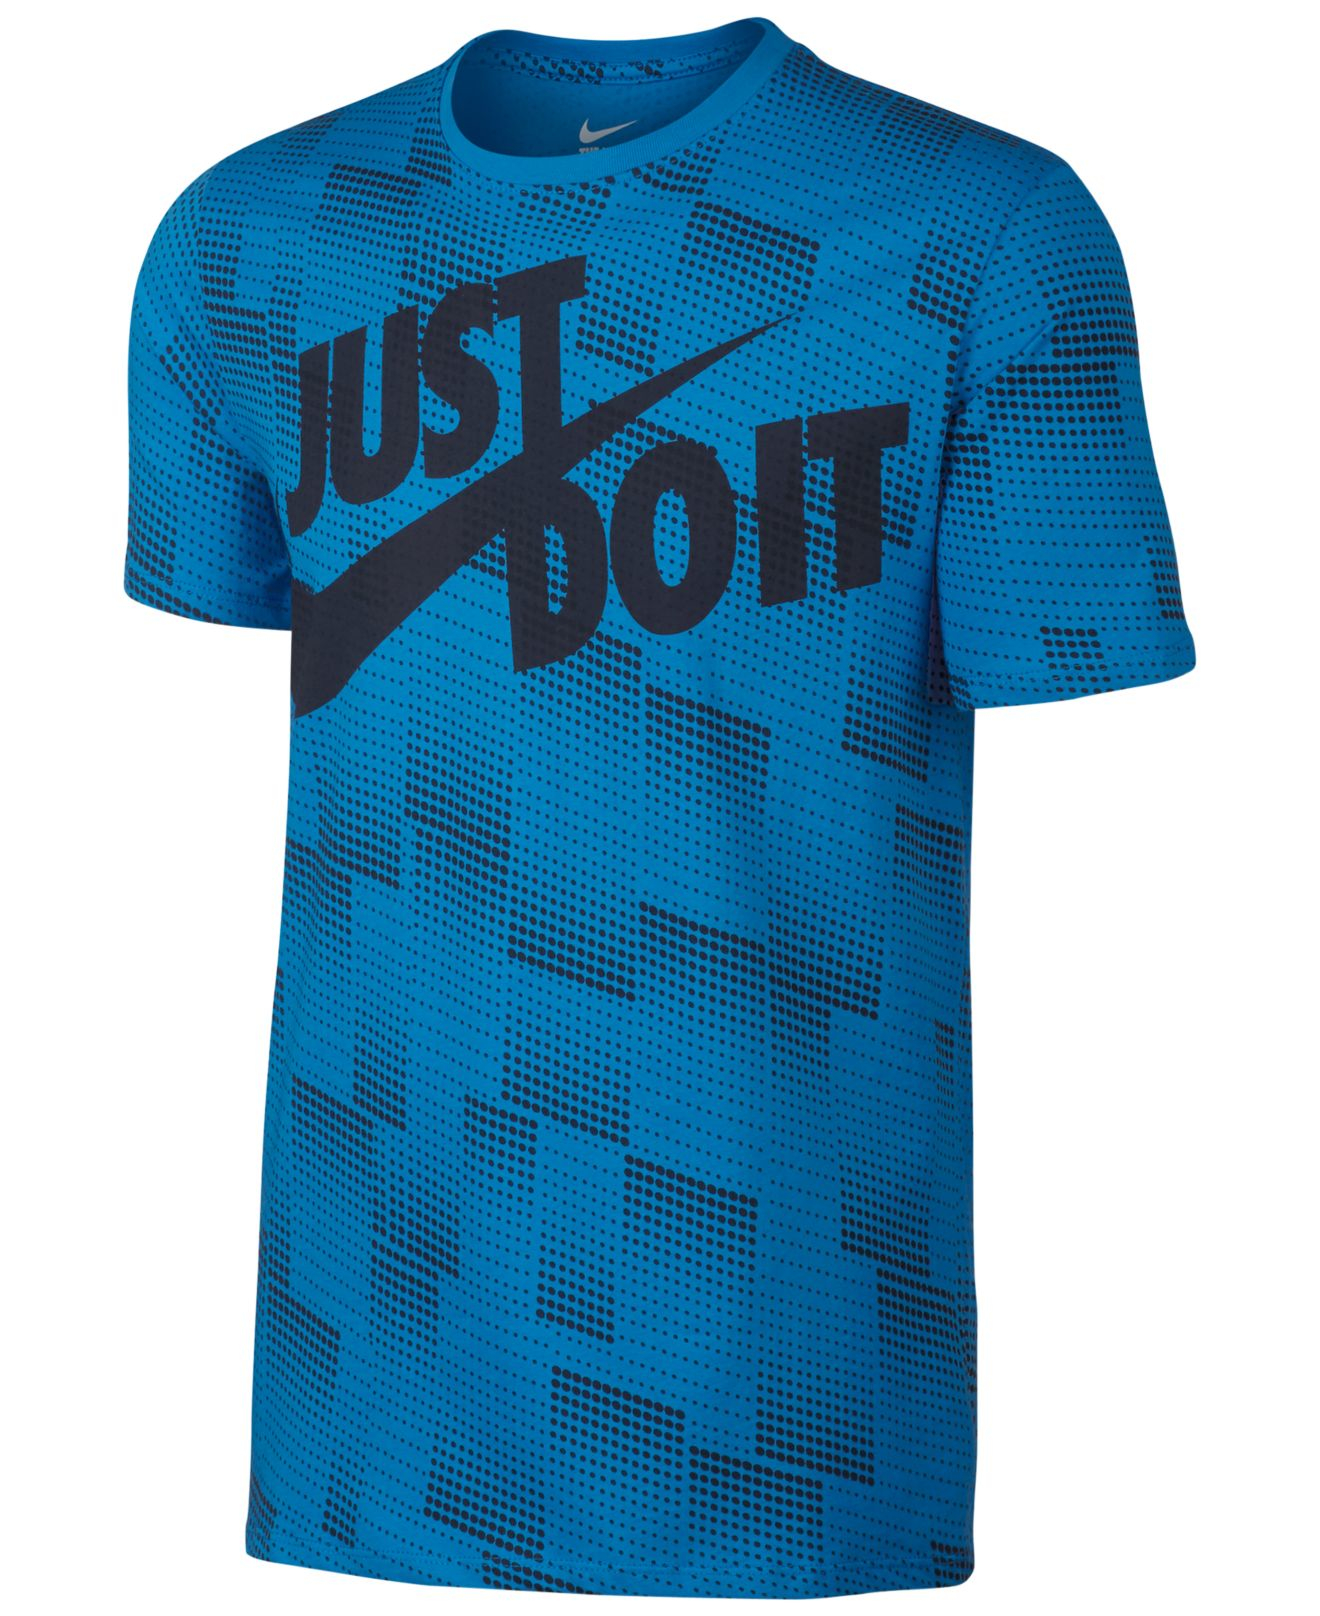 Nike Men 39 S Ultra Just Do It T Shirt In Blue For Men Lyst